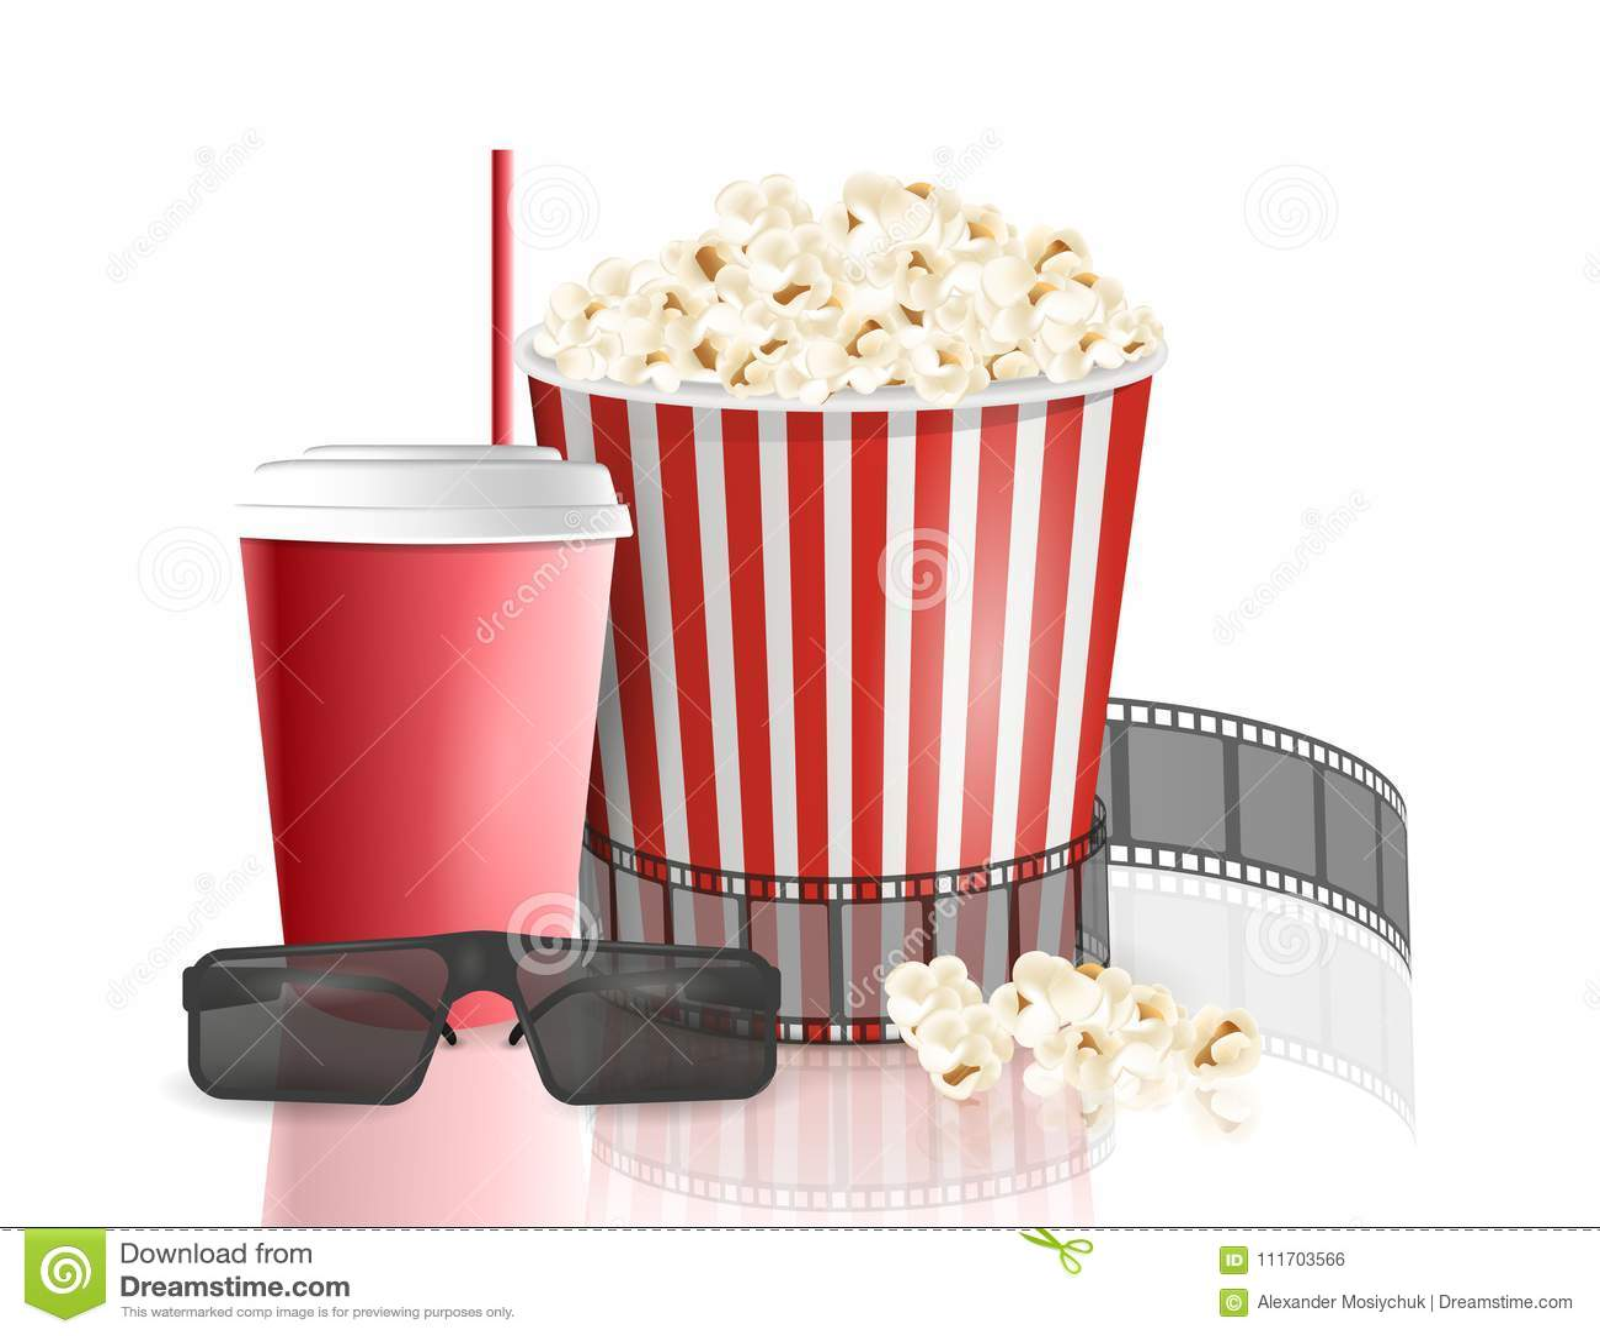 Popcorn 3d Model Free Download